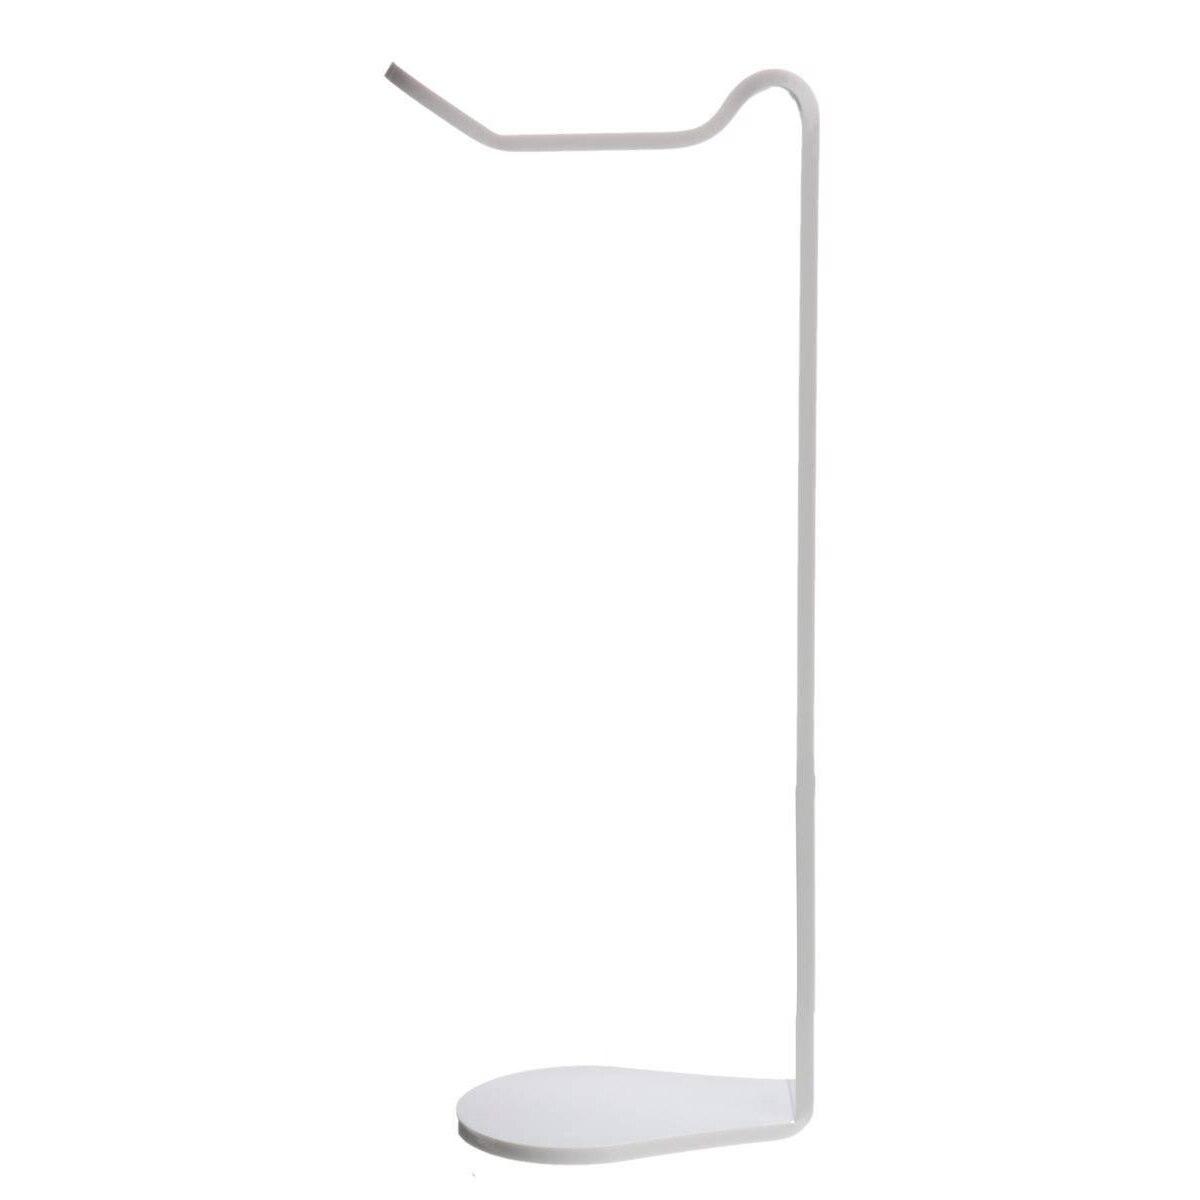 Universal Acrylic Stand for Earphone Headphone Headset Holder Holder for Desk Display Stand white